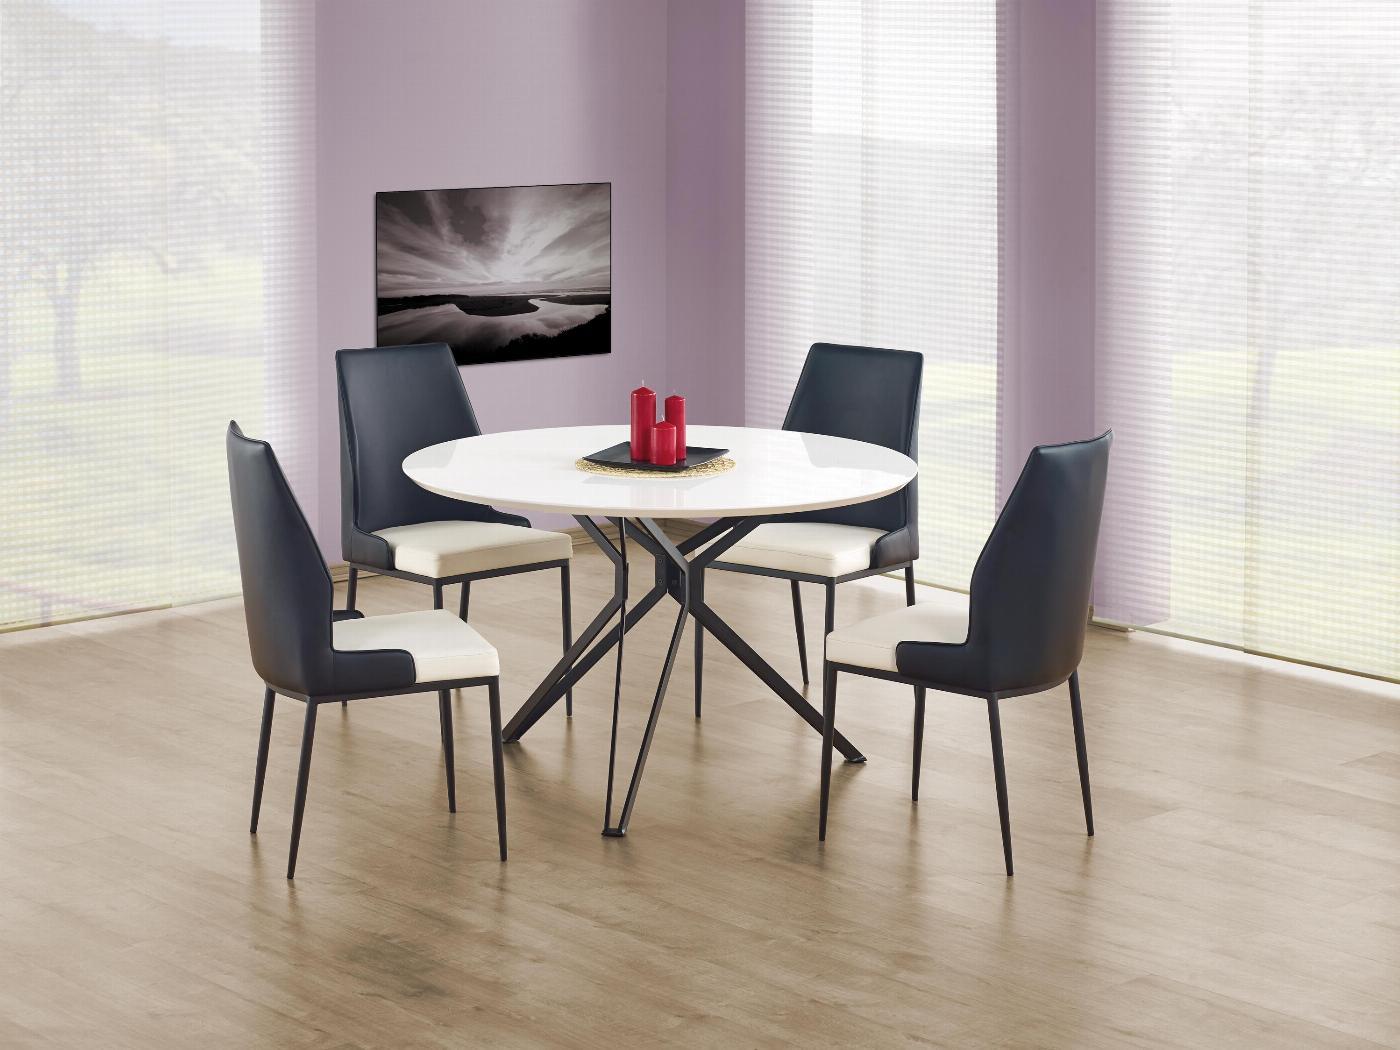 PIXEL stół biały (2p=1szt)